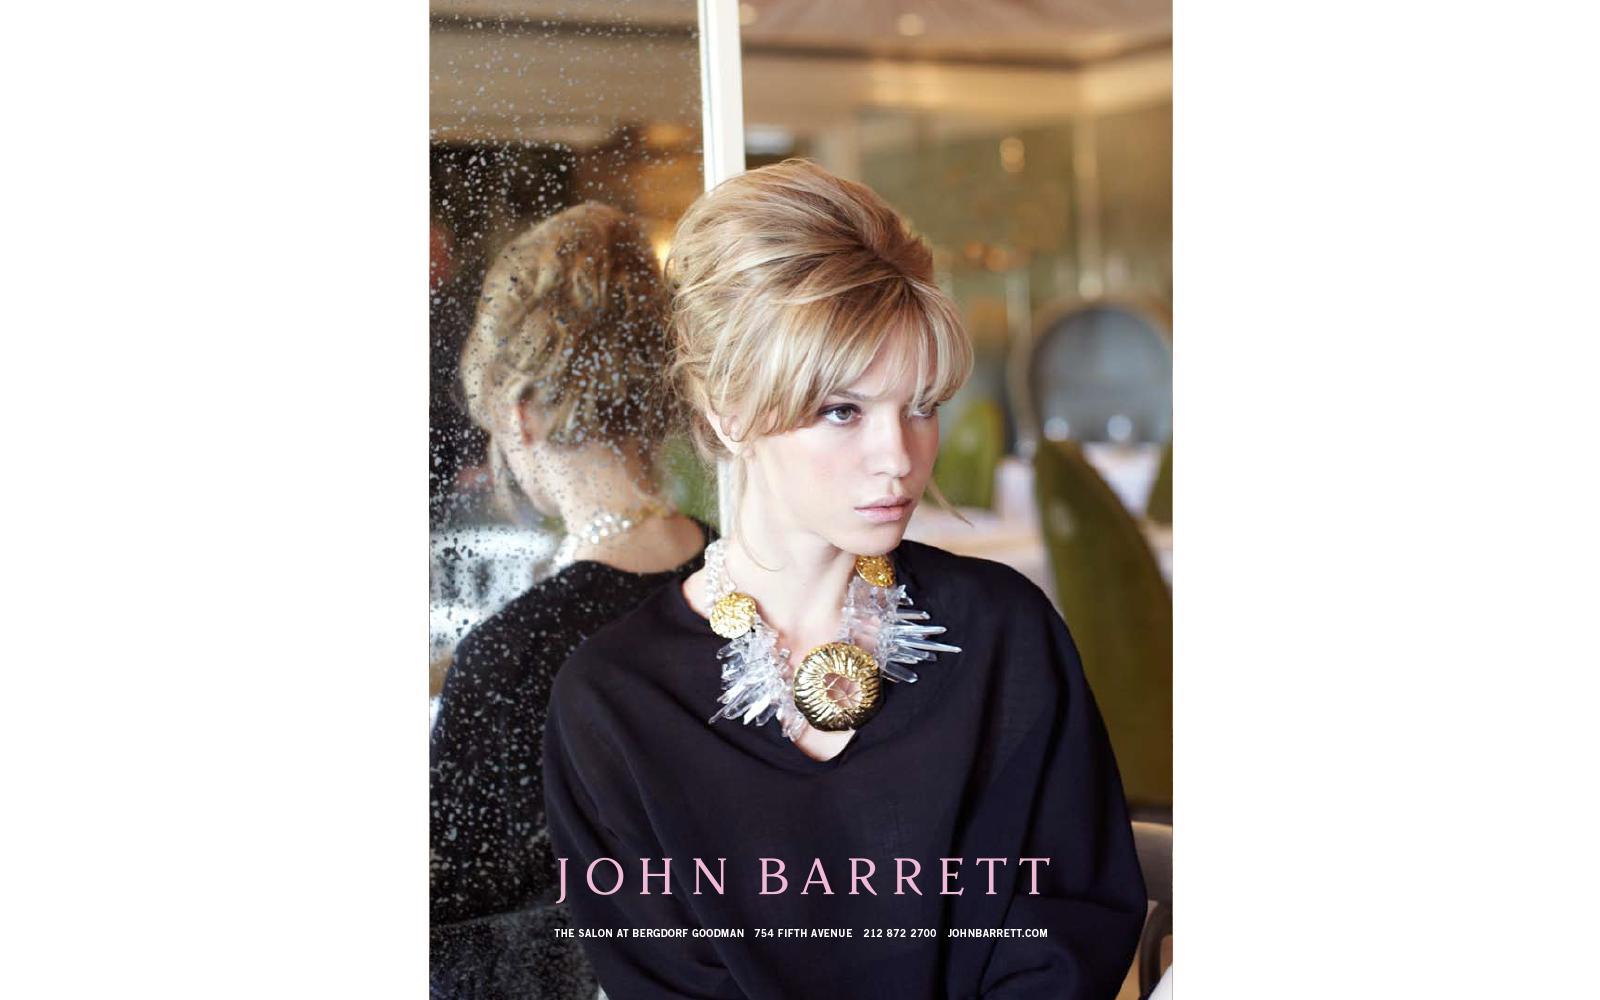 John Barrett Salon - Casting By Laine